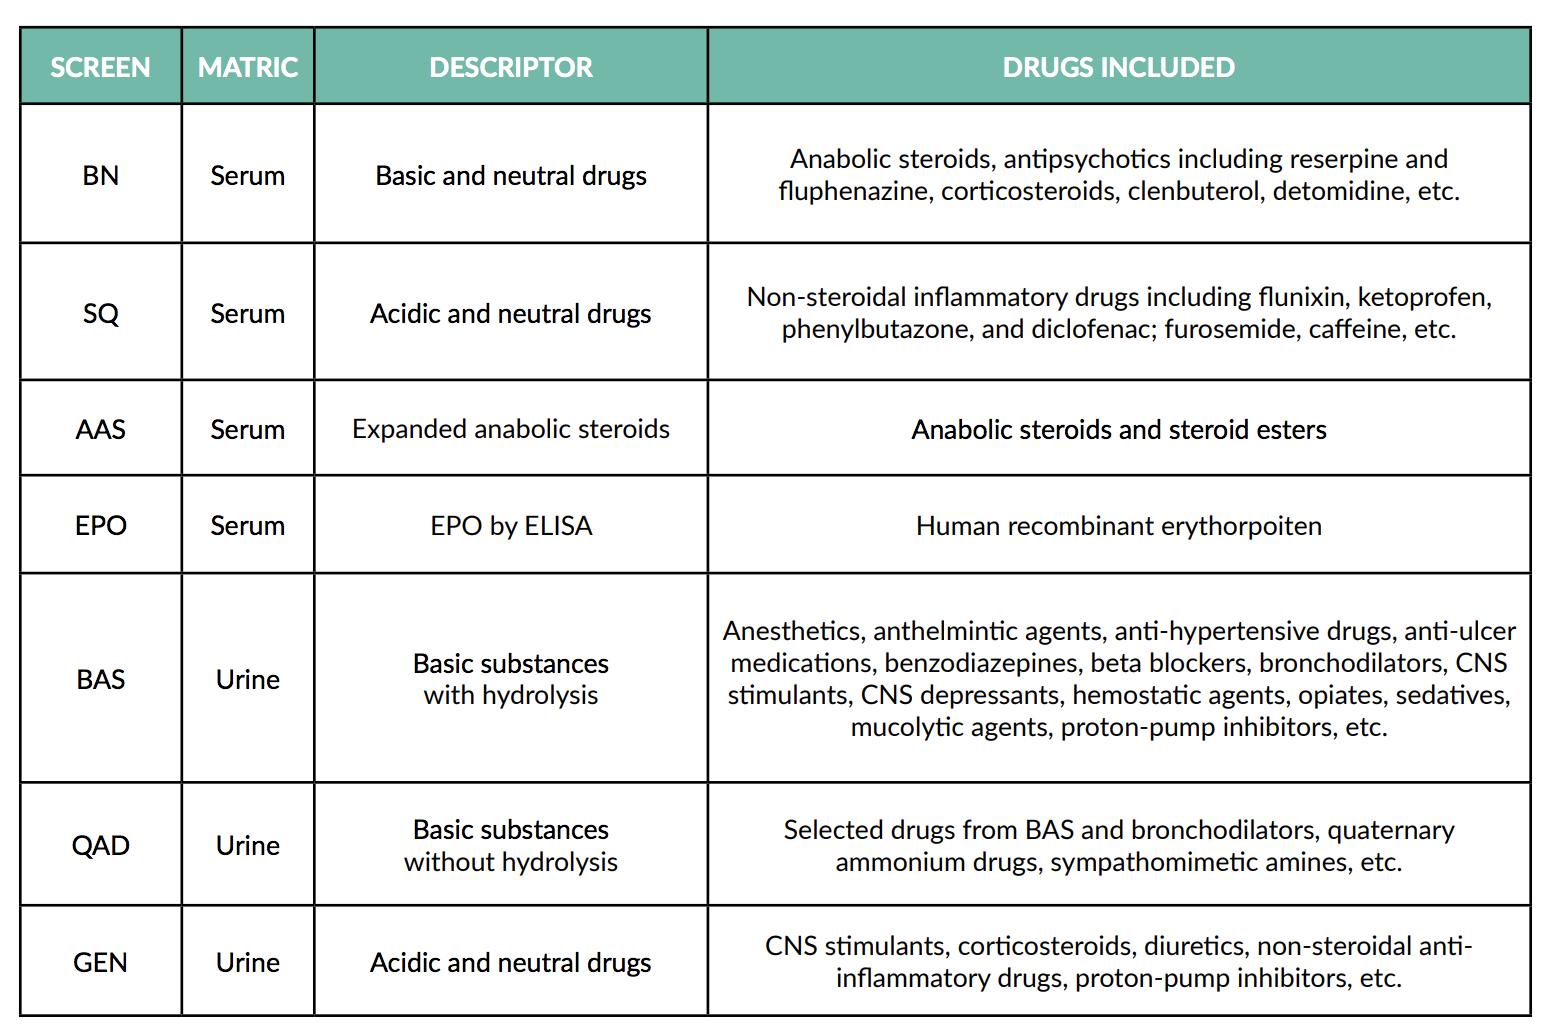 StressLess Drug Testing - CENTERLINE DISTRIBUTION